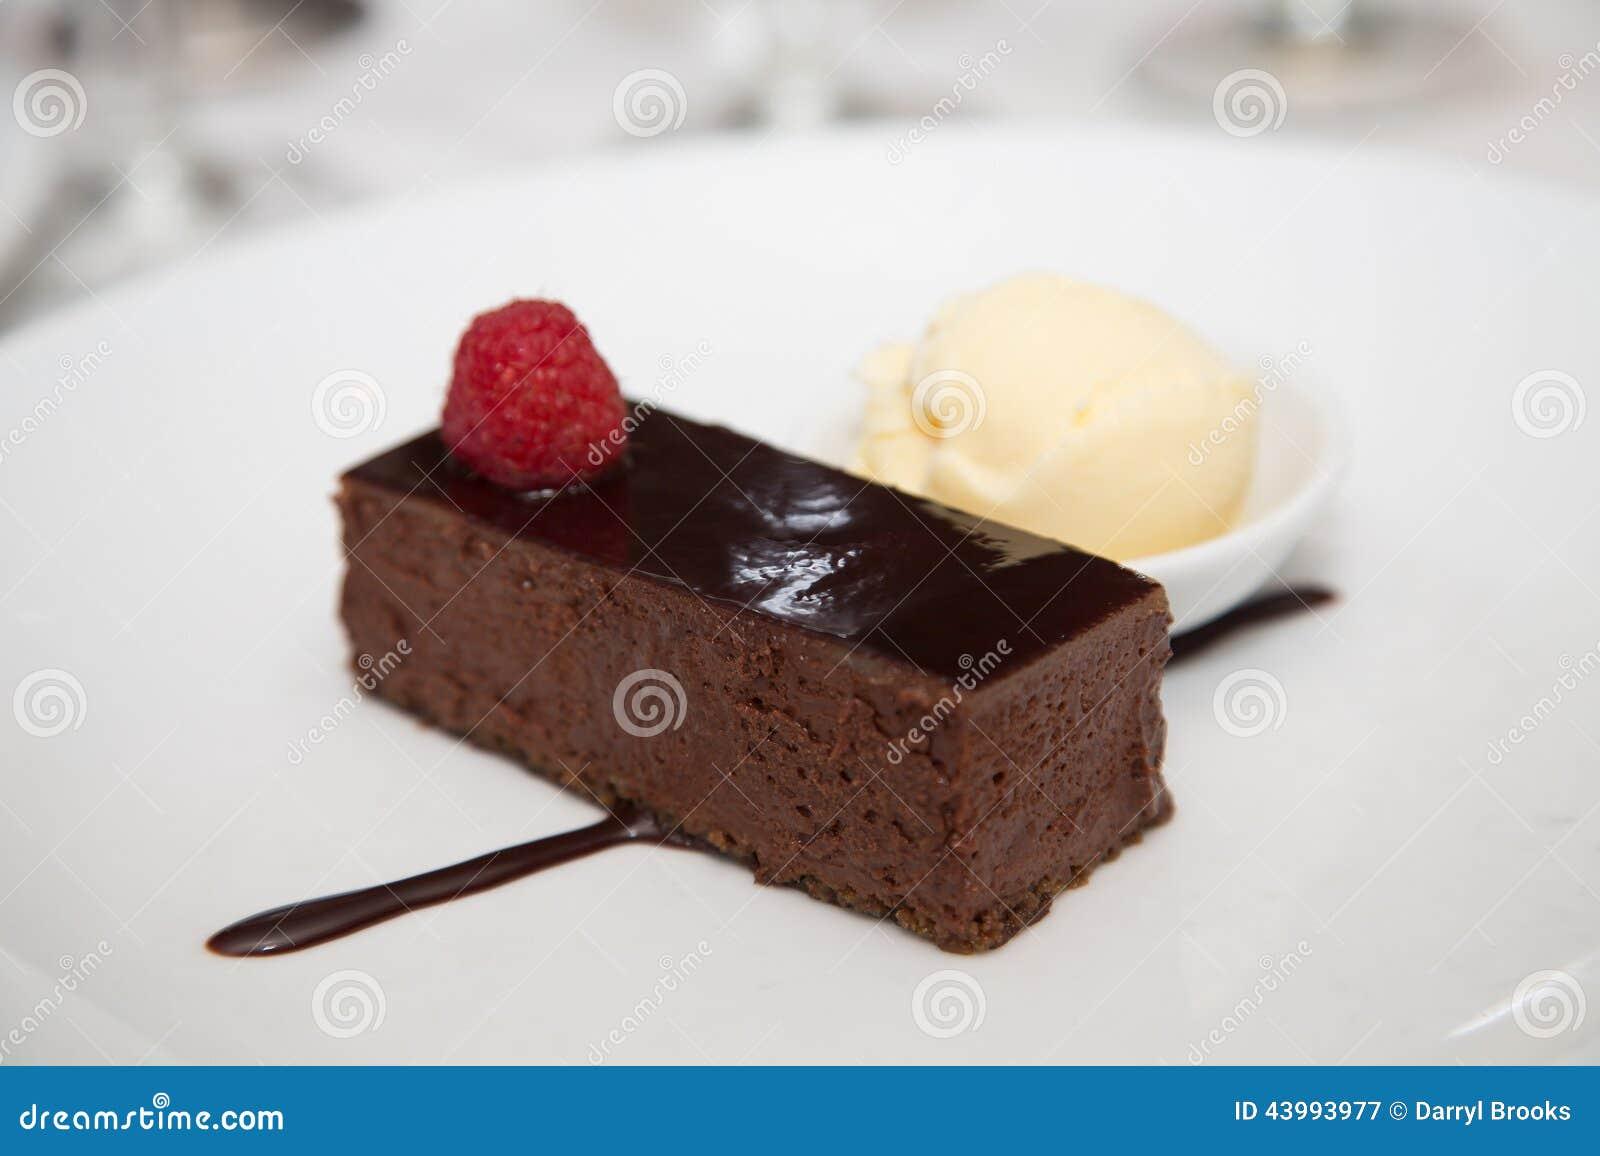 Chocolate Fudge Dessert With Raspberry And Ice Cream Stock